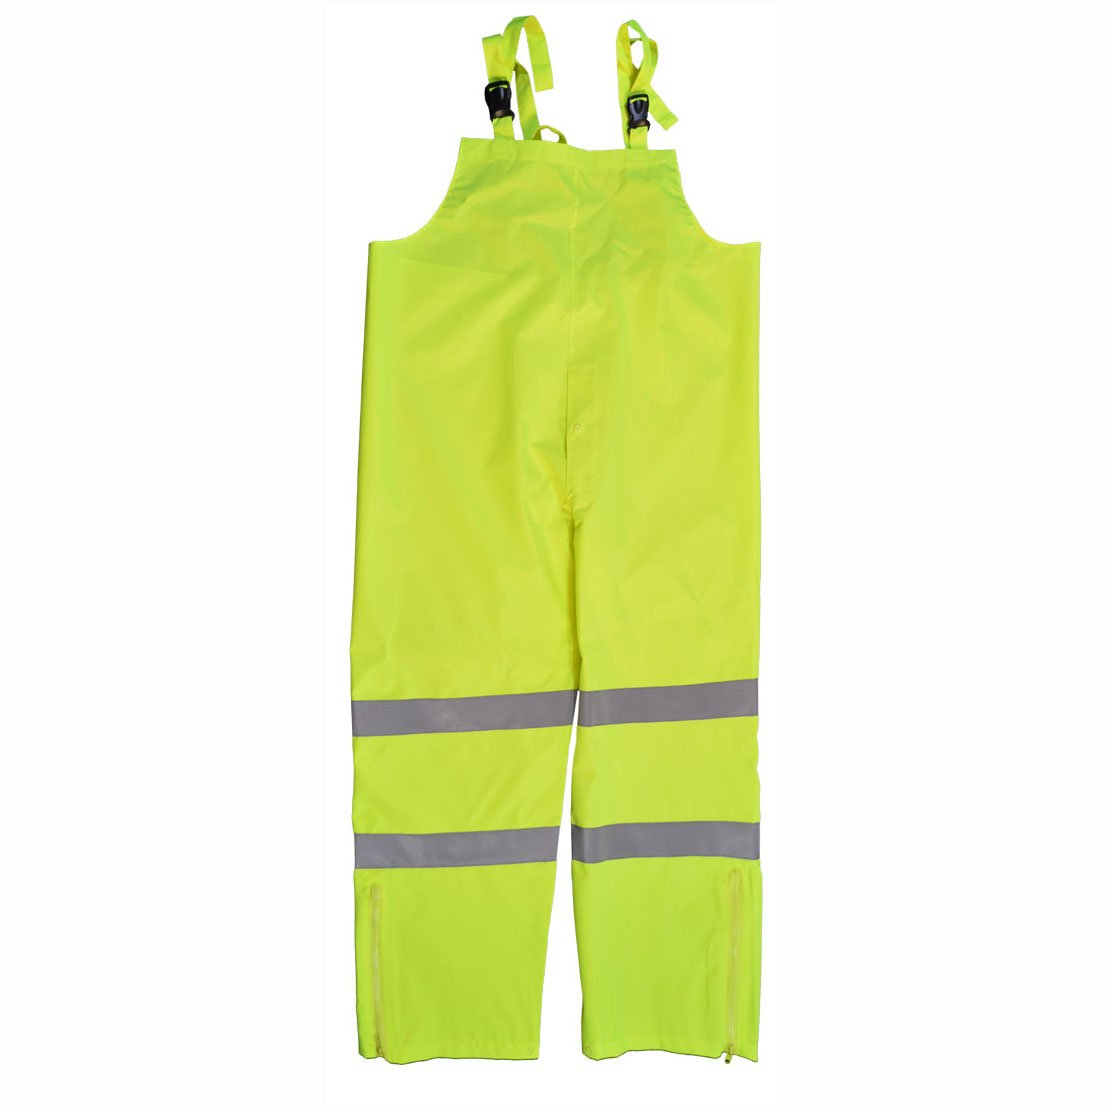 Petra Roc LBIP-CE-XL Bib Rain Pants, ANSI Class E 300D Oxford/PU Coating Waterproof, Lime Green, XL